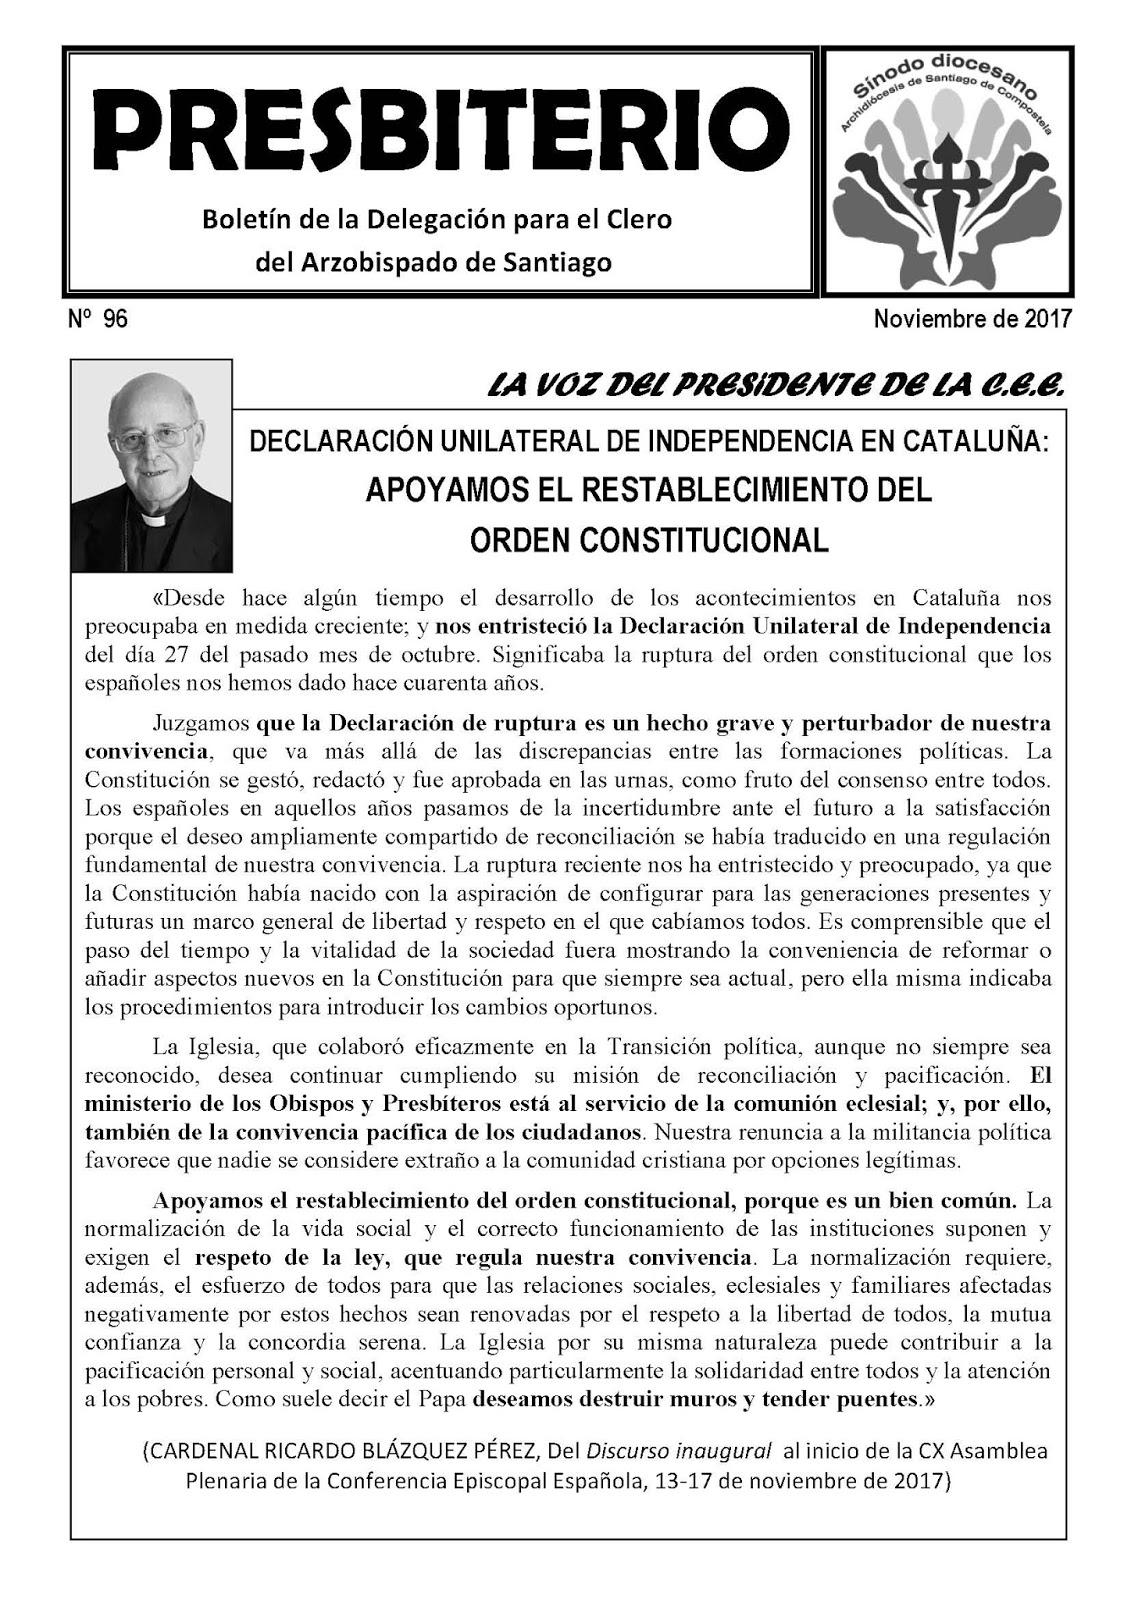 https://www.dropbox.com/s/jii1bw9rwt6jd3o/Presbiterio_96.pdf?dl=0